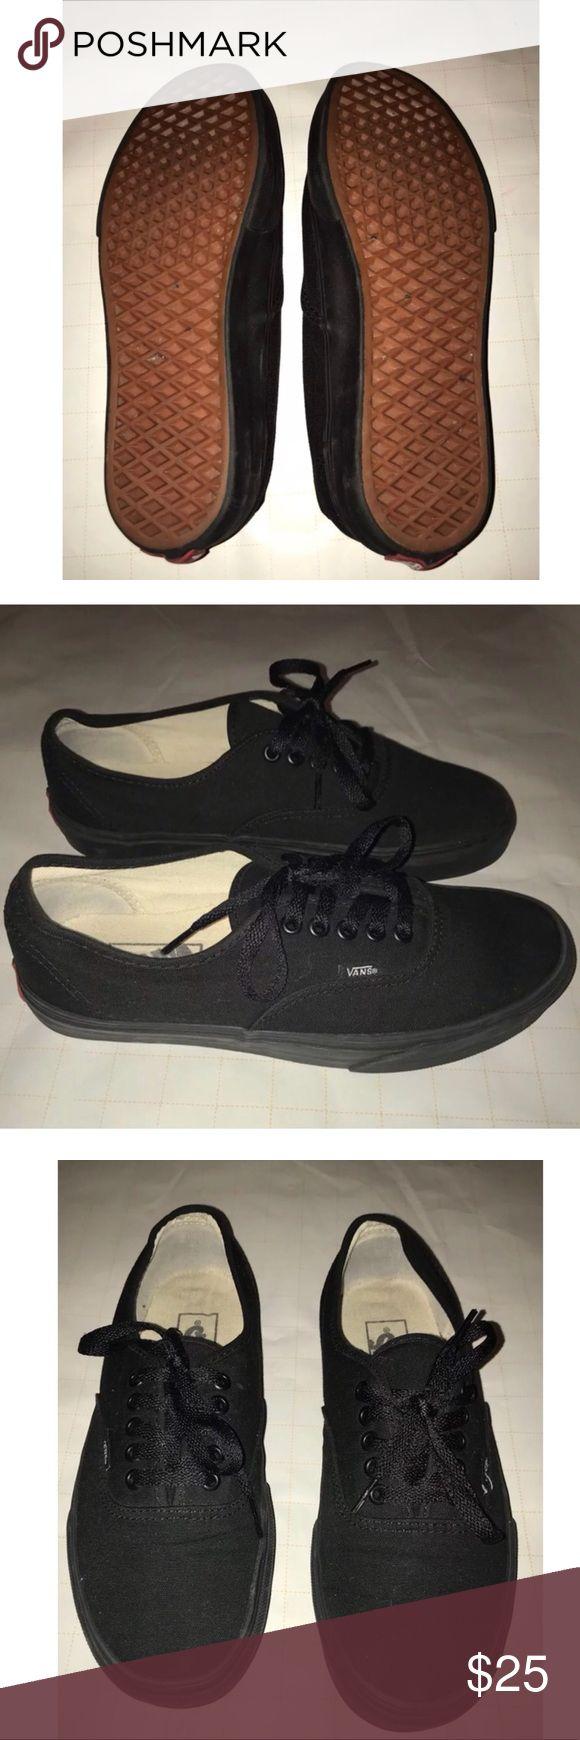 🔥SALE🔥Classic Black Vans shoes Vans The Authentic, Vans original and now iconic style, is a simple low top, lace-up with durable canvas upper, metal eyelets, Vans flag label and Vans original Waffle Outsole. Men's size 8, Women size 9.5 Vans Shoes Sneakers